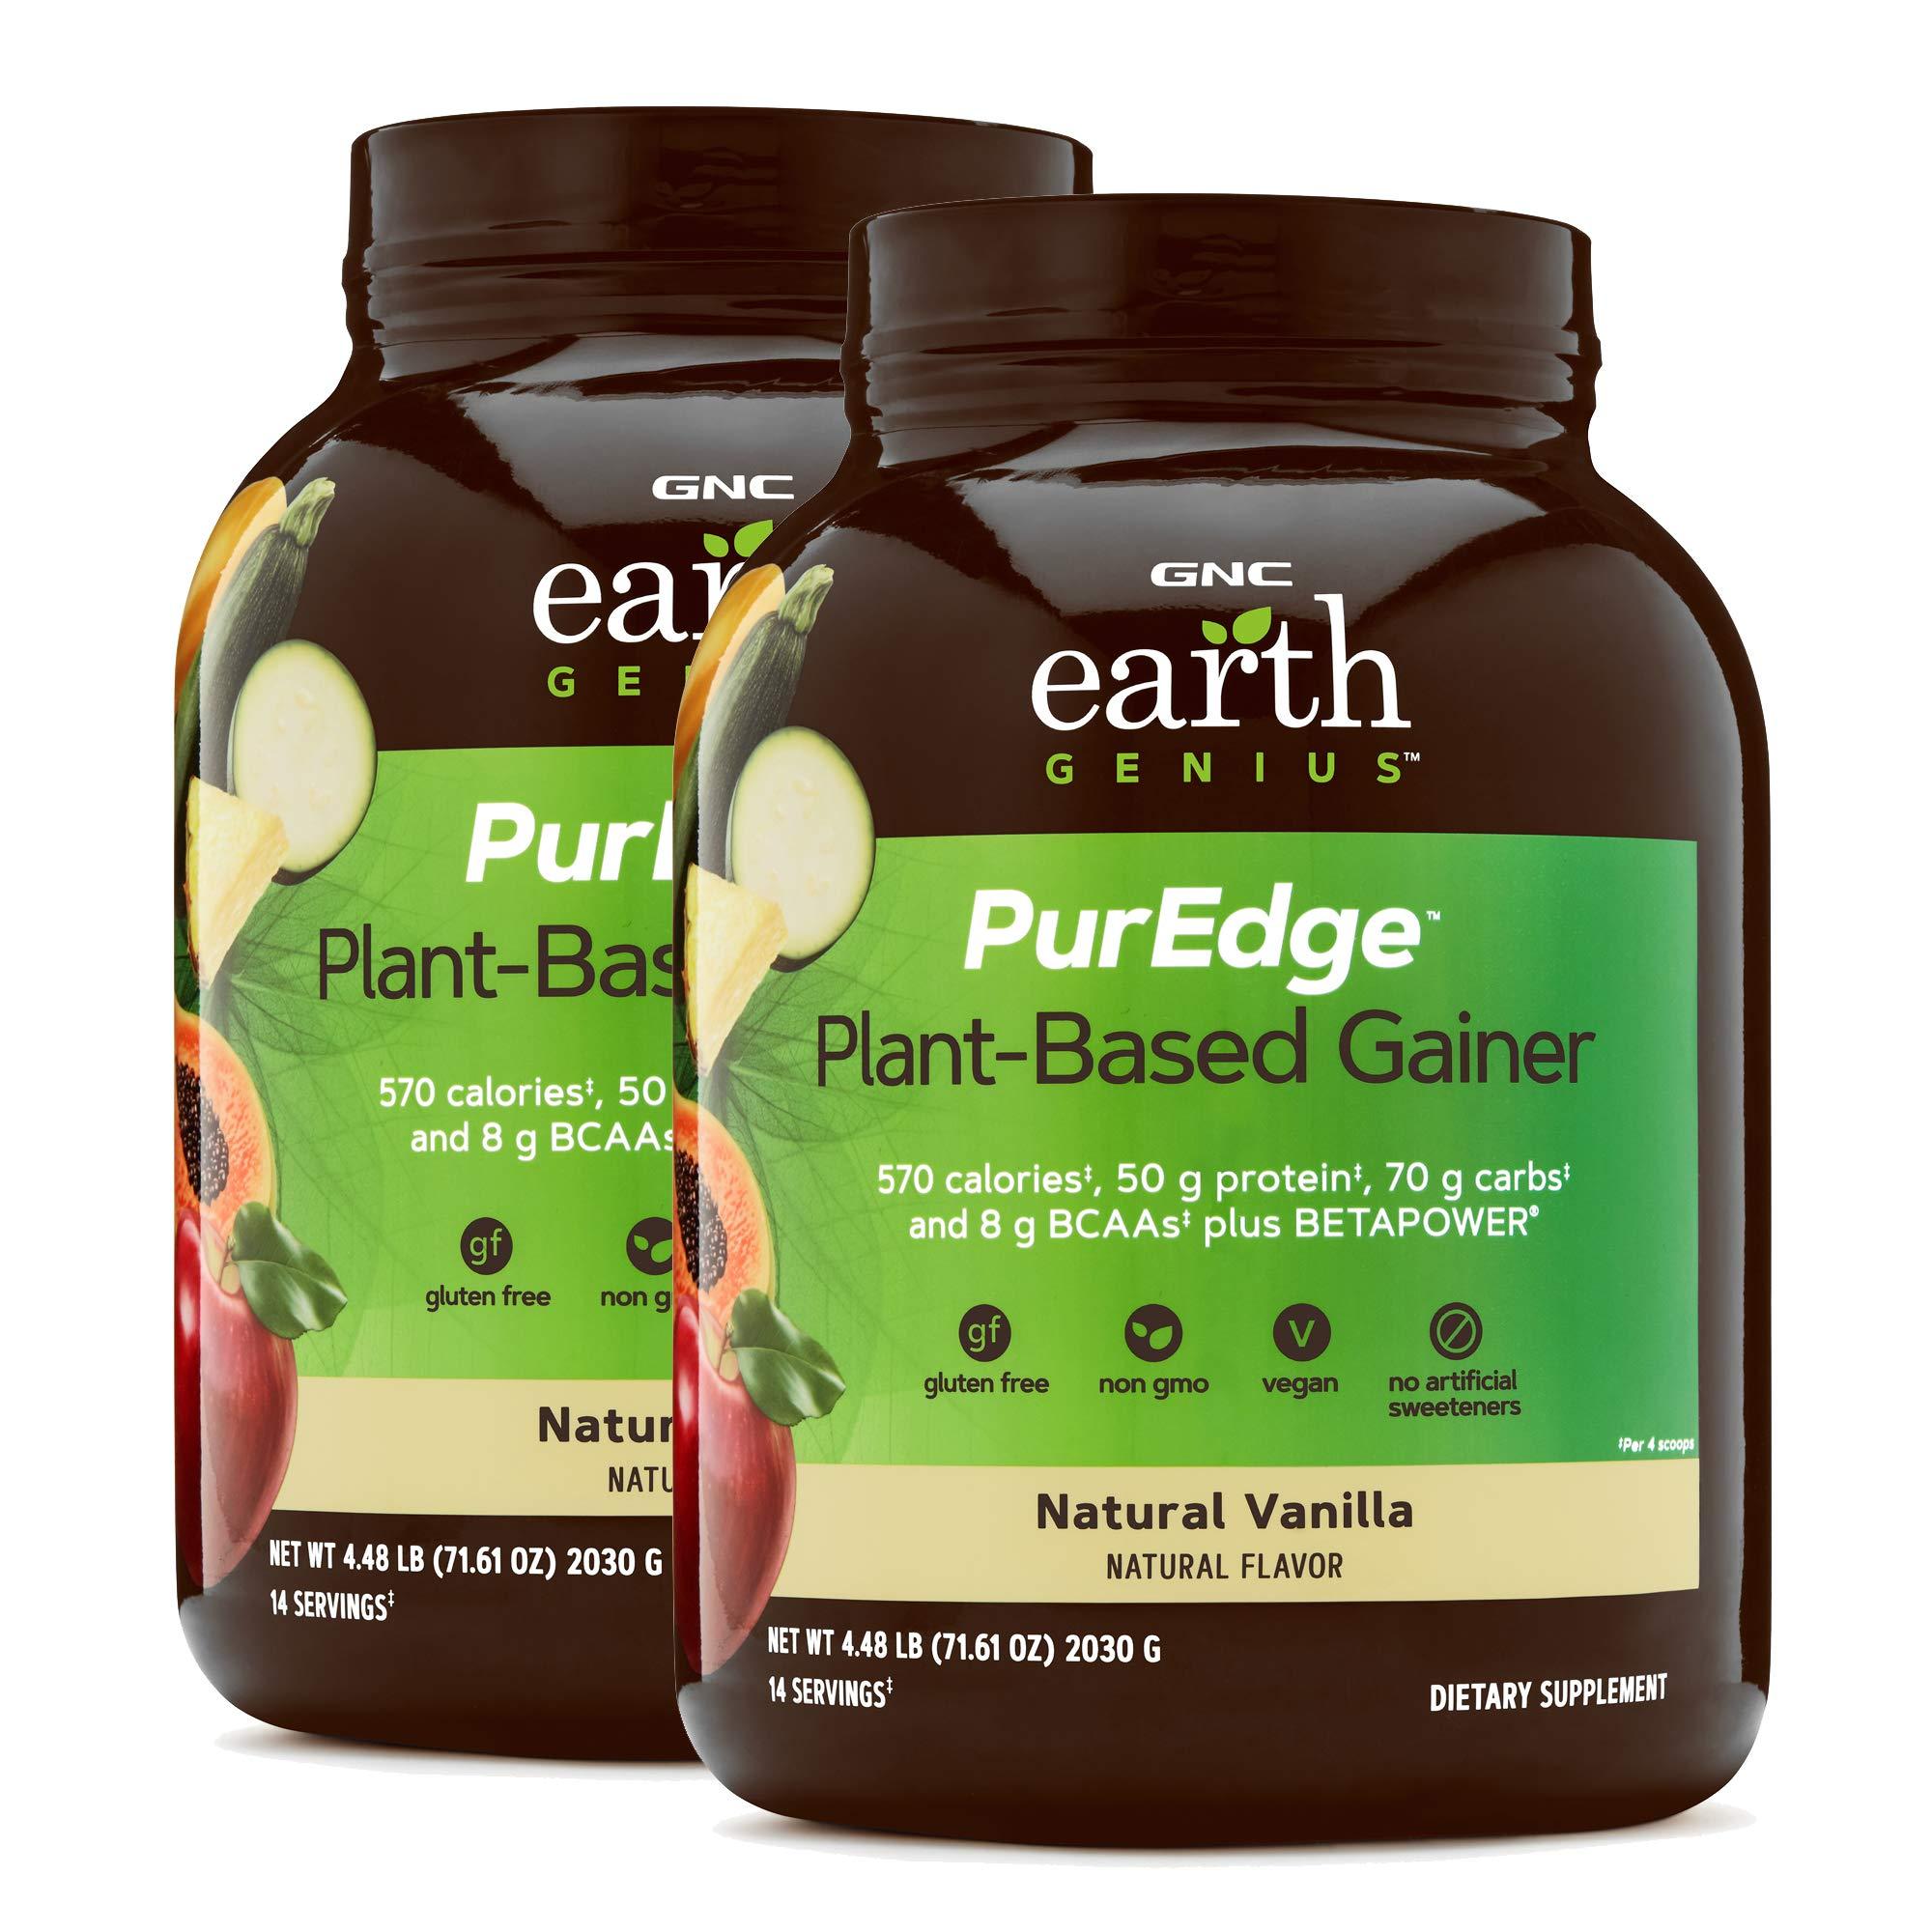 GNC Earth Genius PurEdge Plant-Based Gainer - Natural Vanilla - Twin Pack